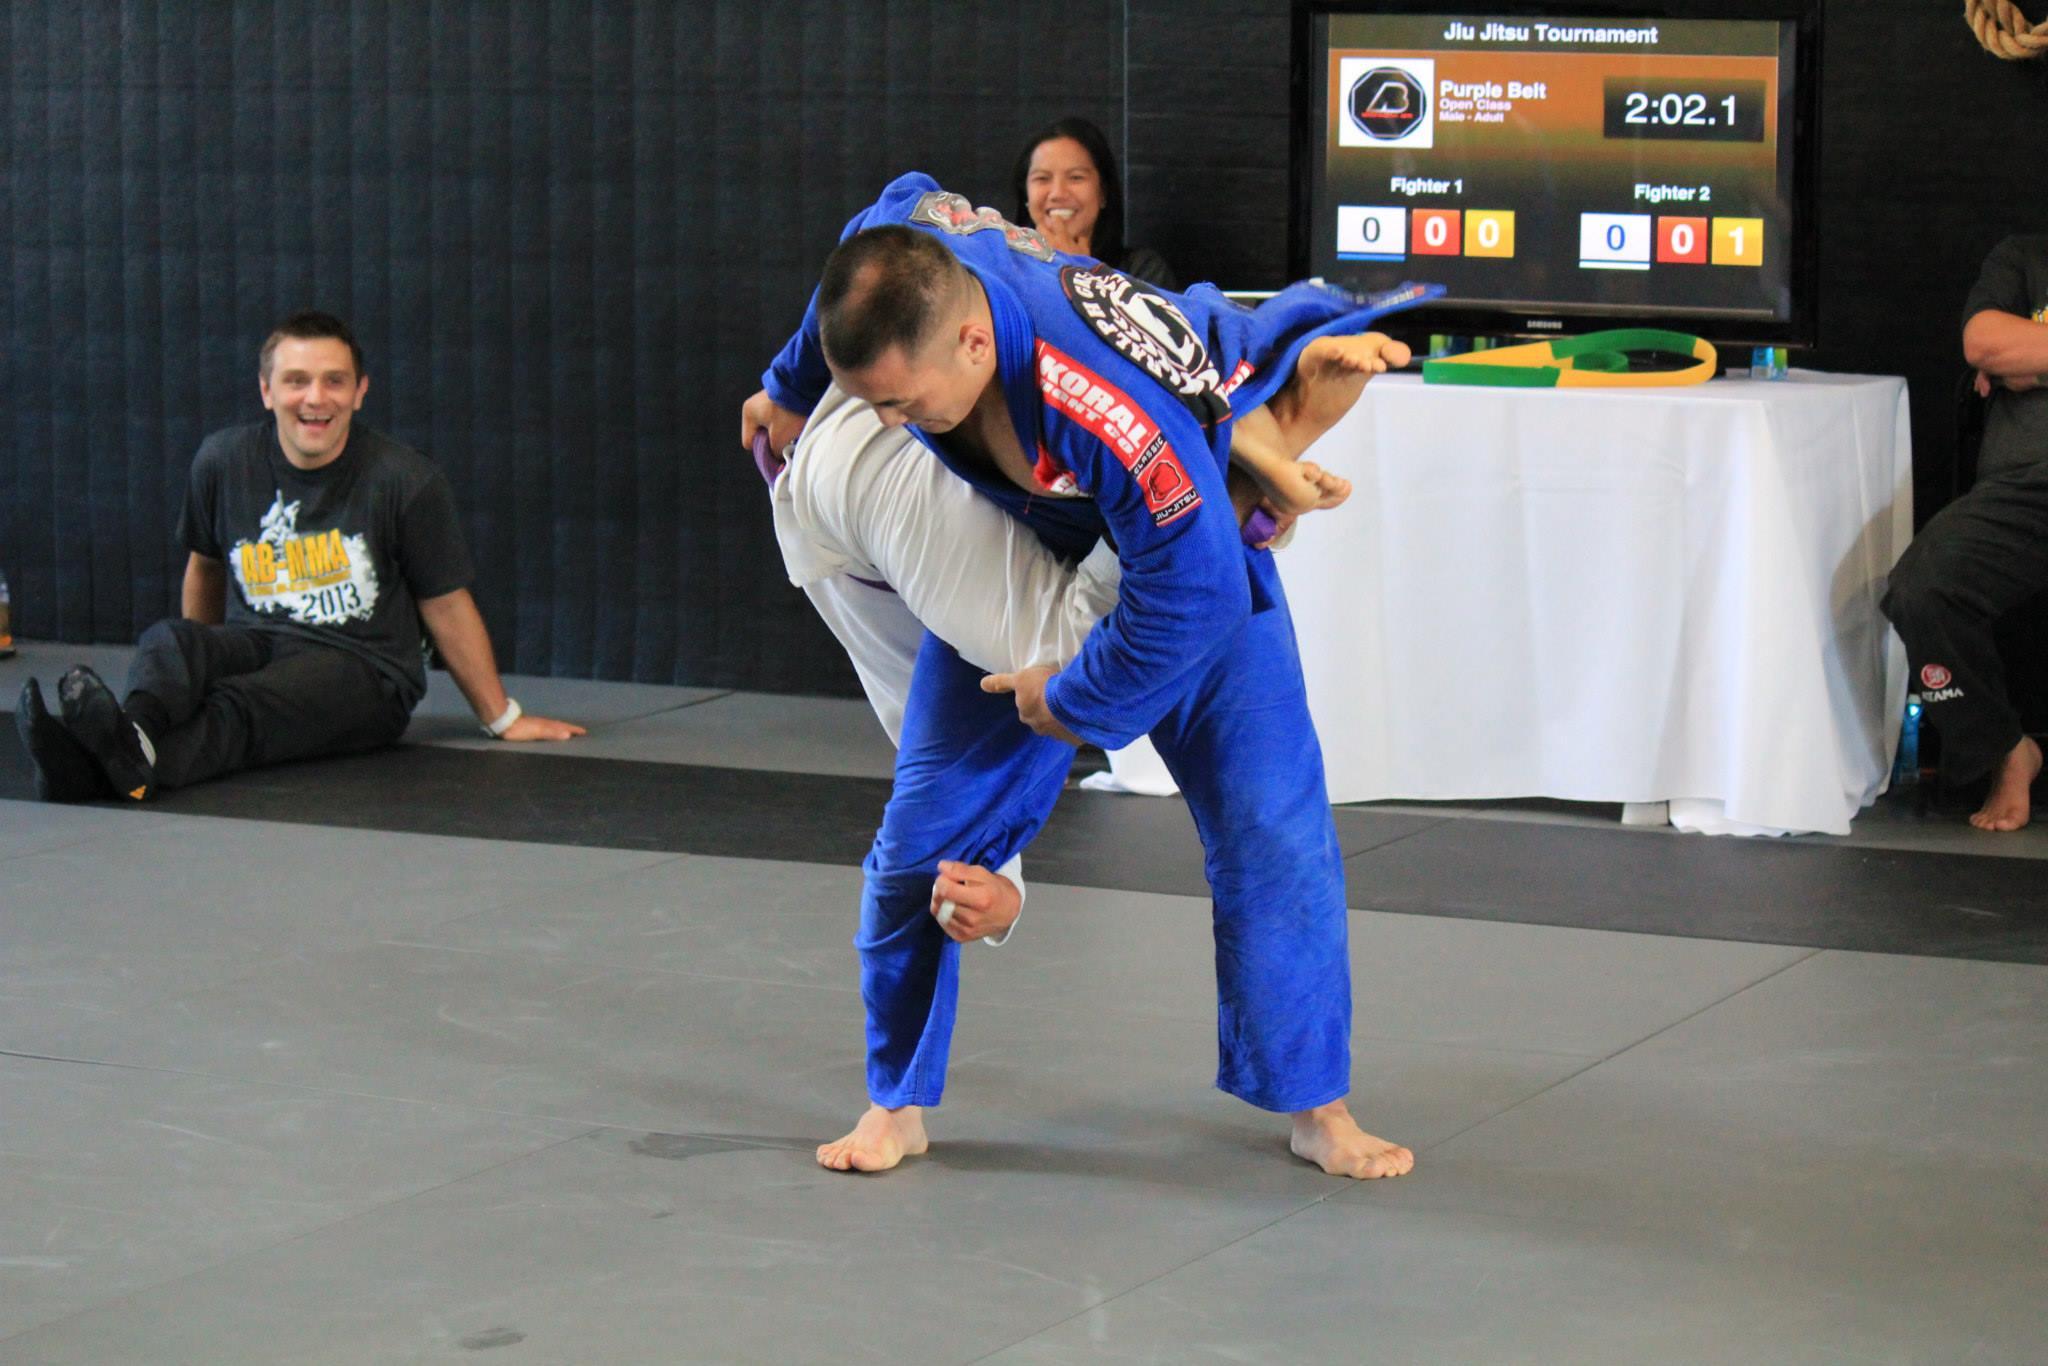 ab tournament july 20 hiroshi matsui